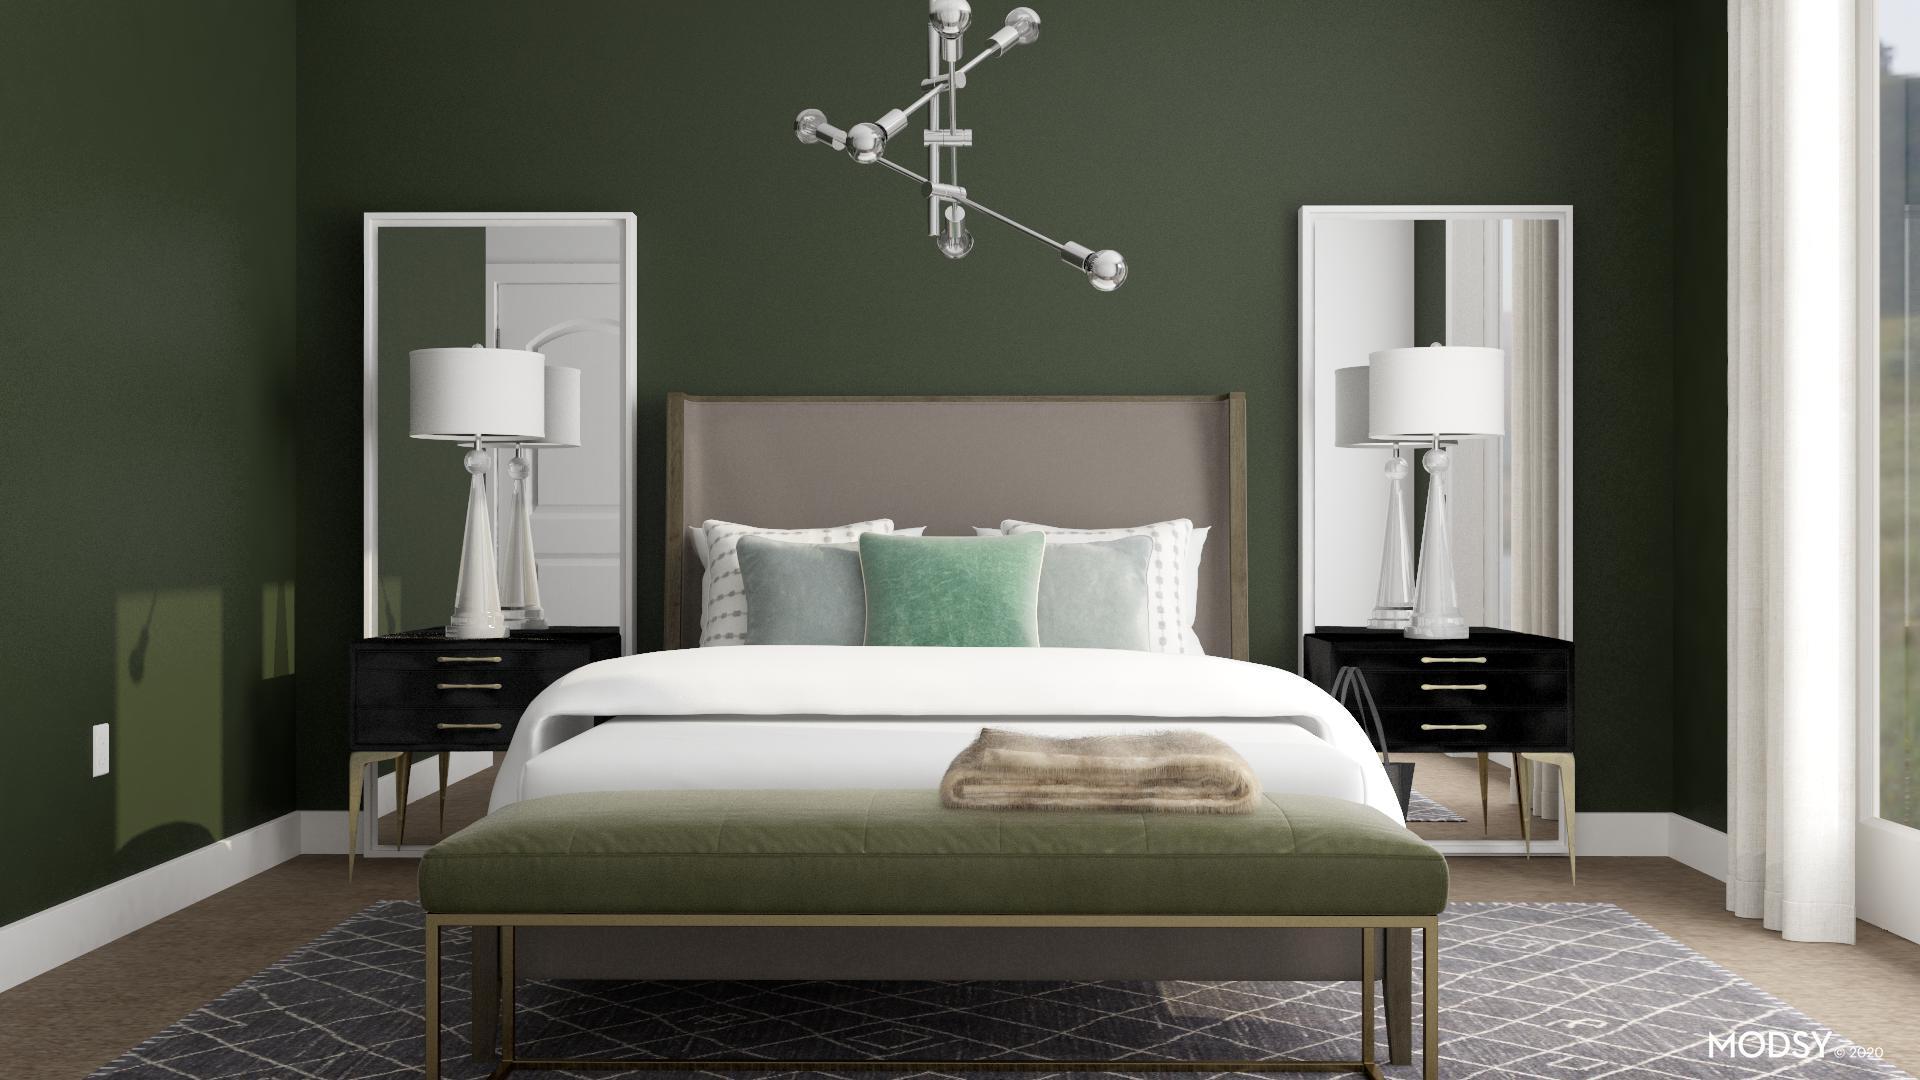 A Modern Green Bedroom | Modern-Style Bedroom Design Ideas